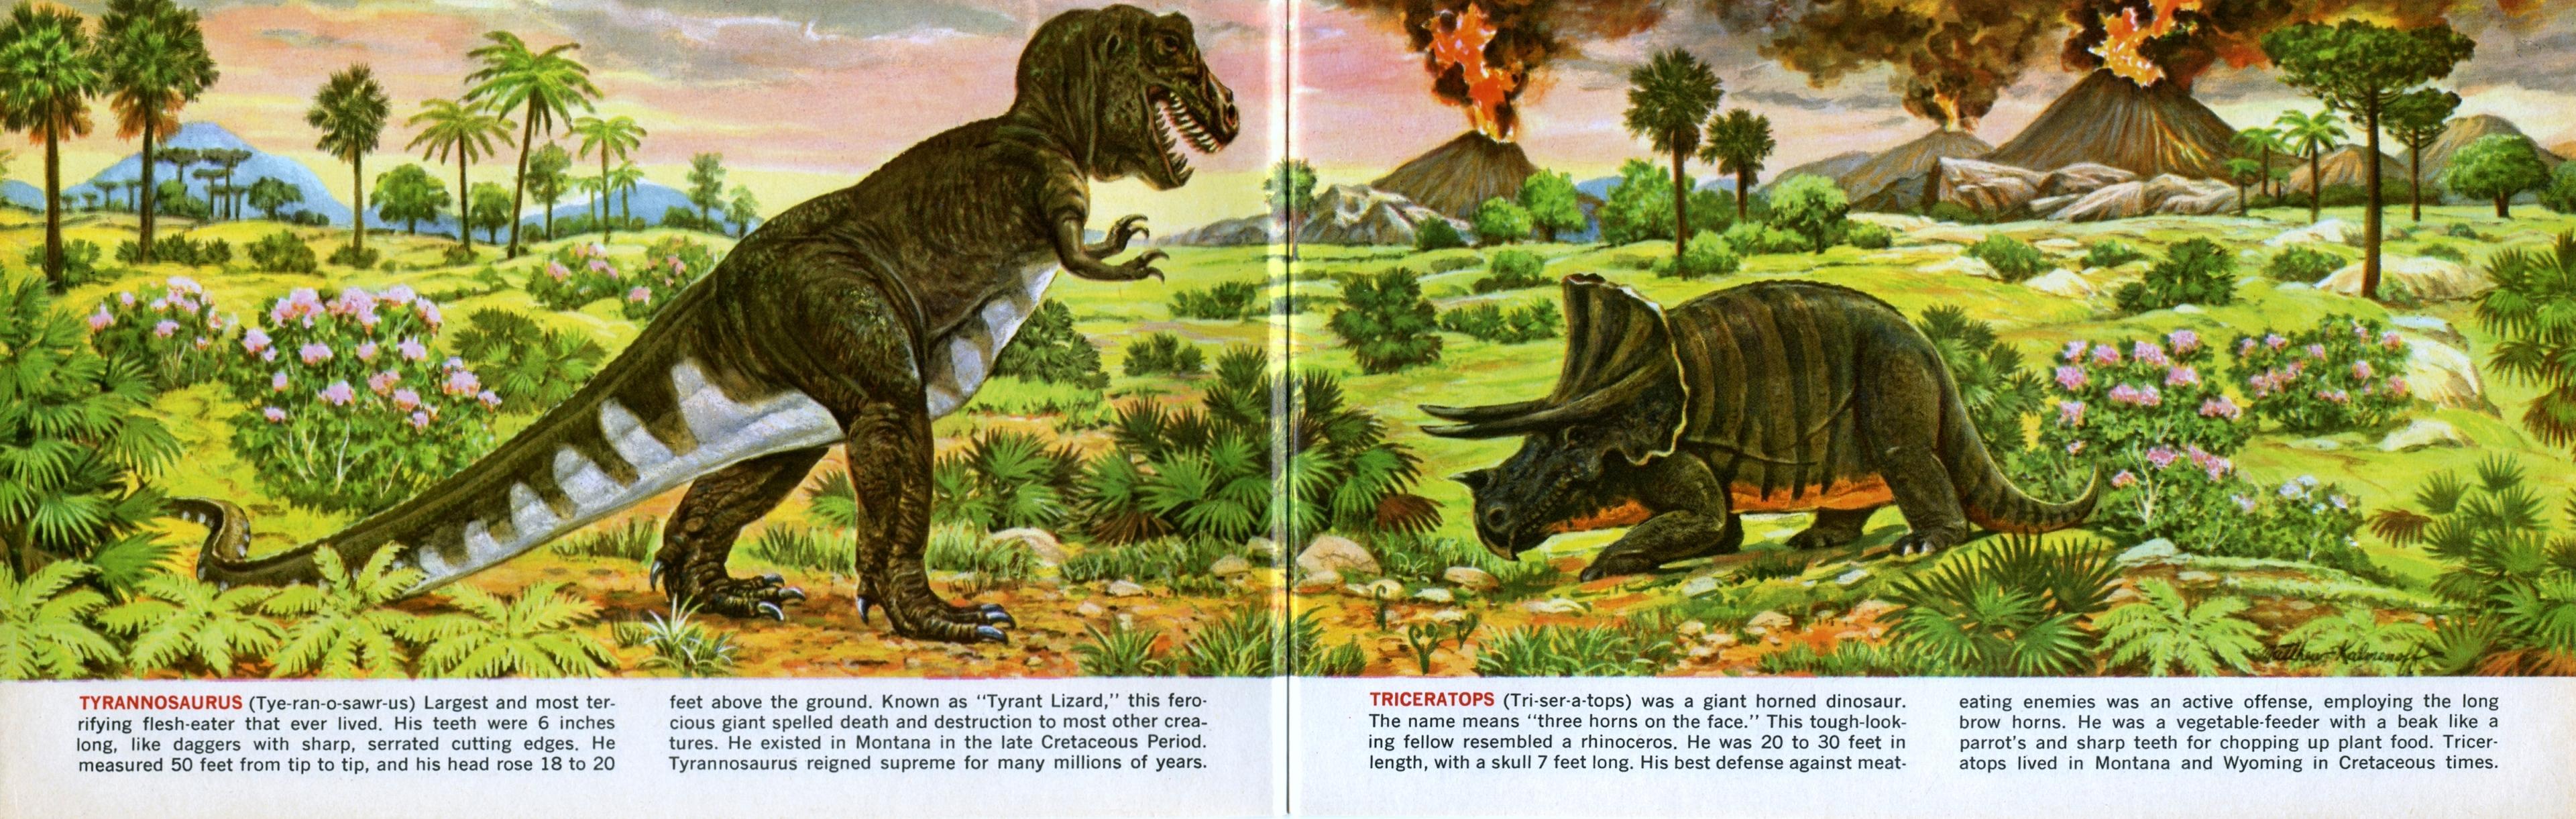 sinclair dinosaur 1967 -006